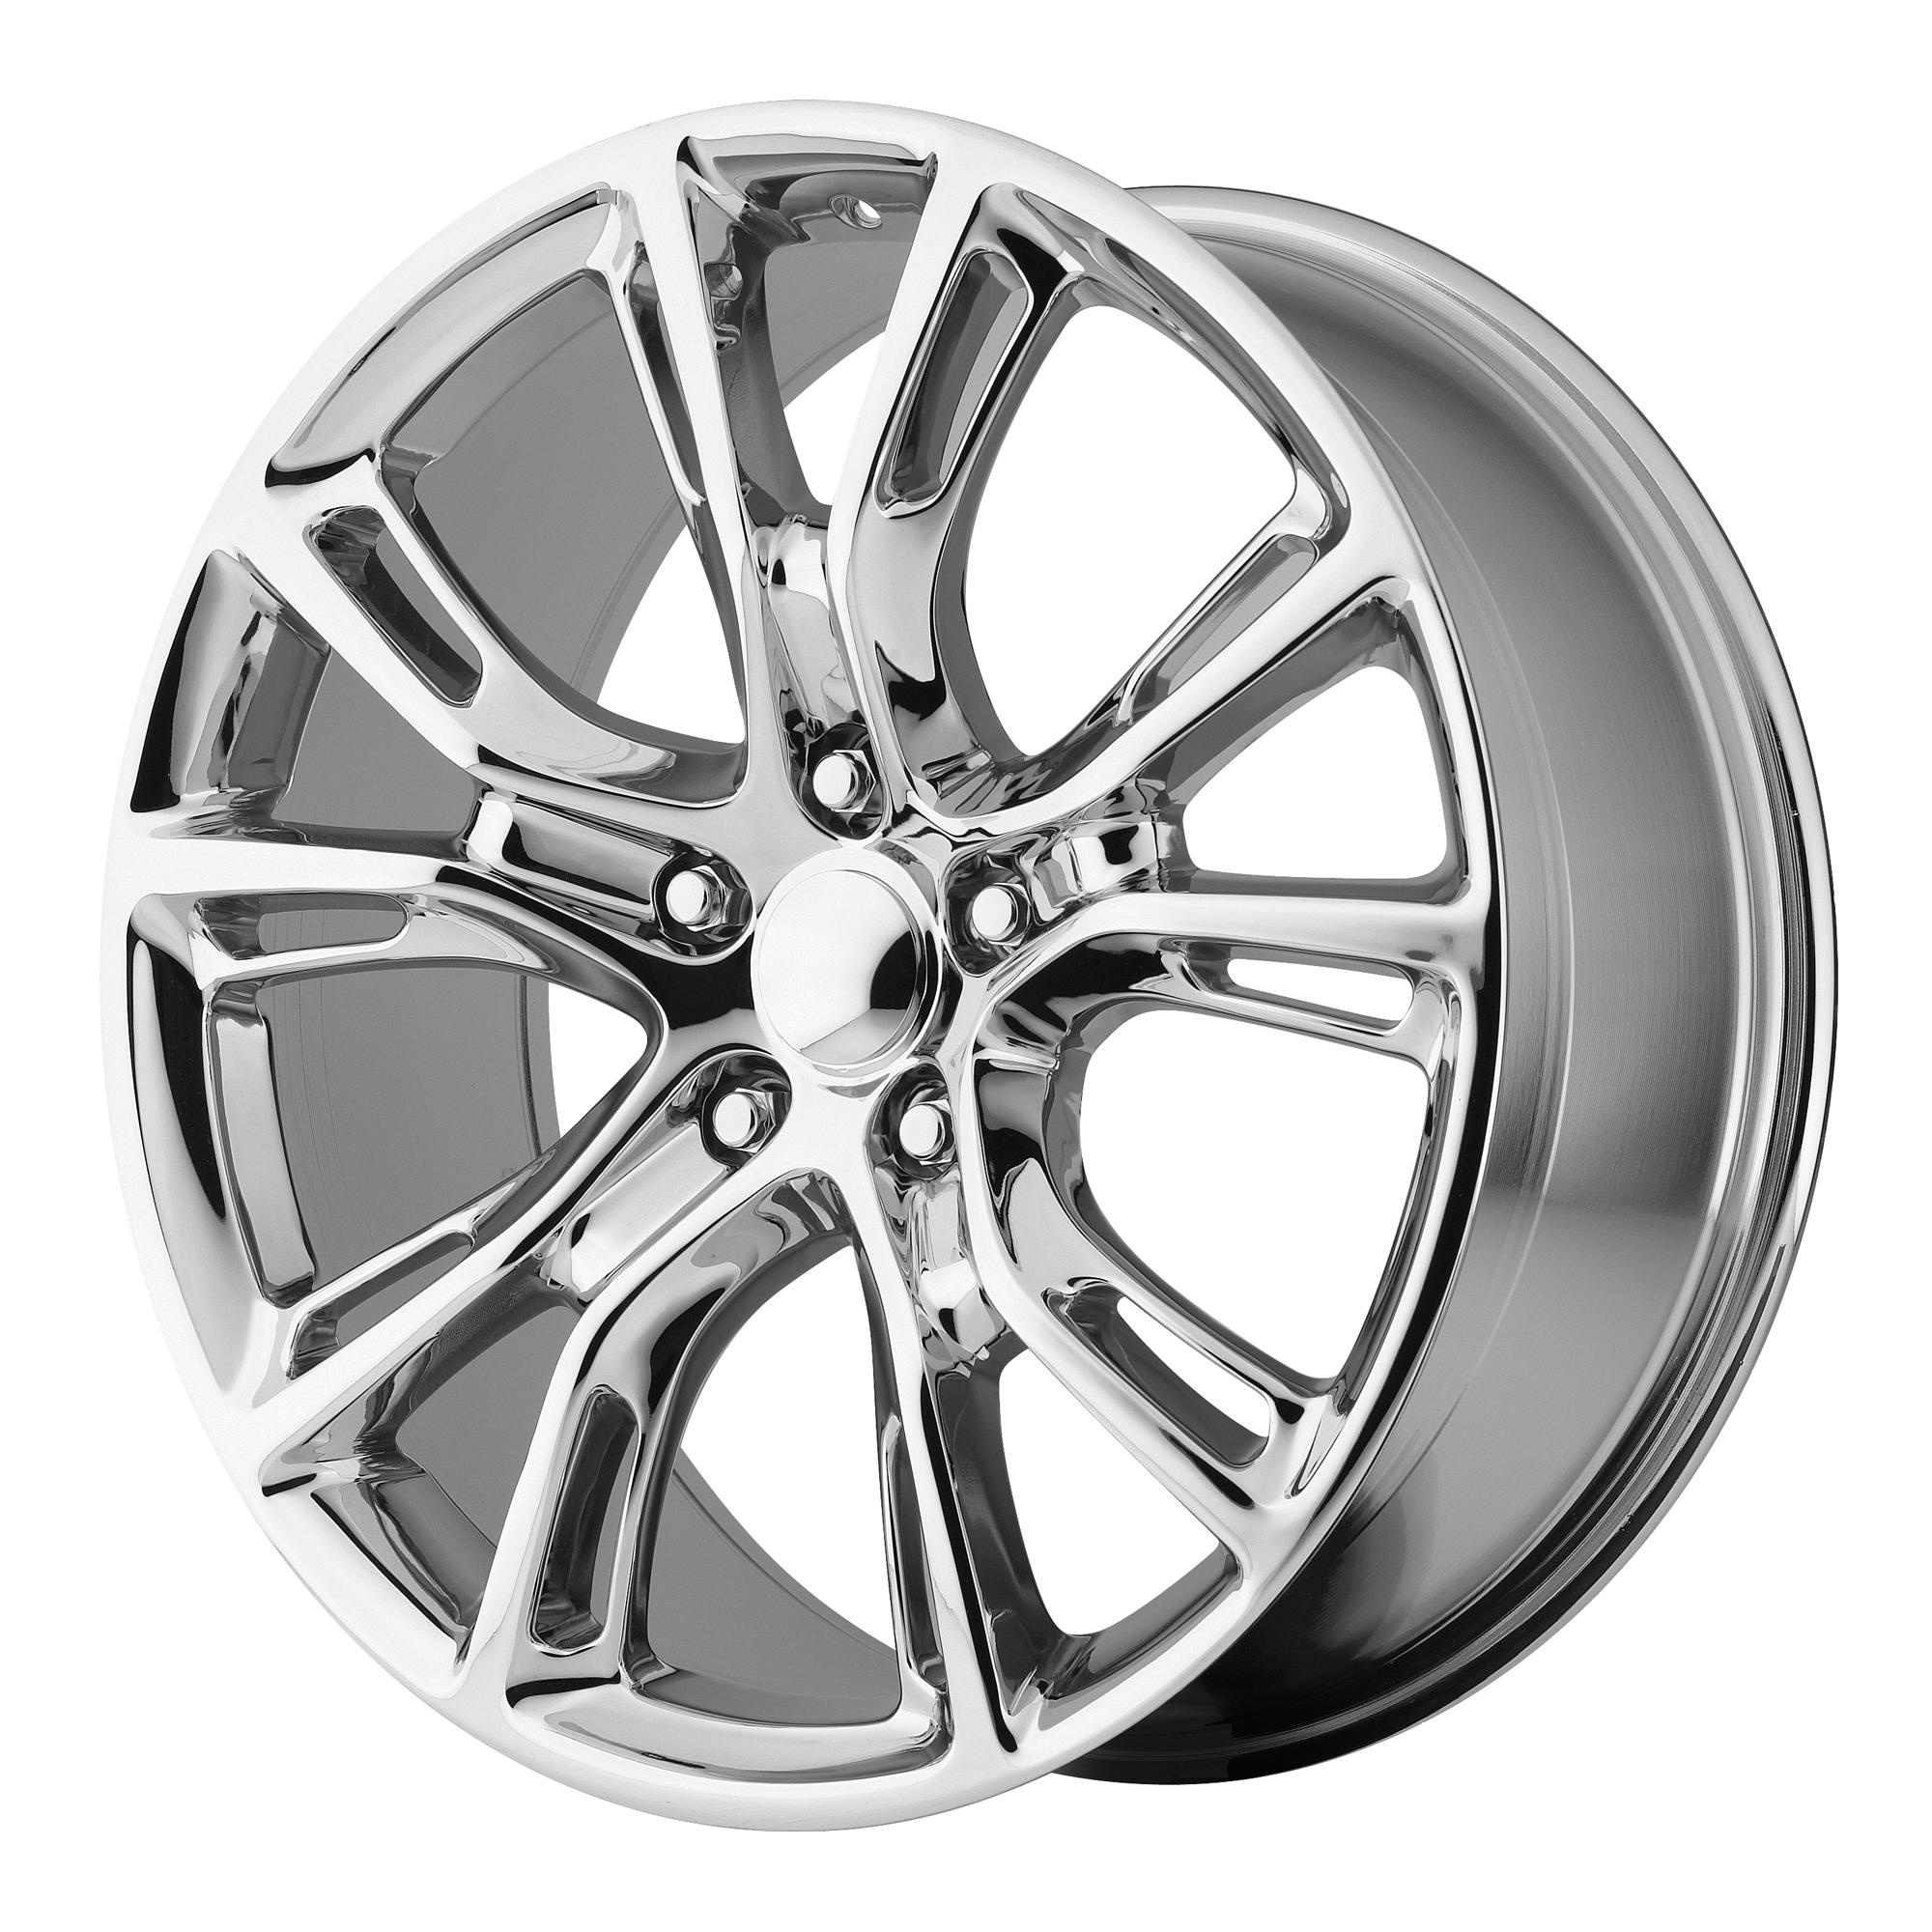 OE Creations Replica Wheels OE Creations PR137 Chrome